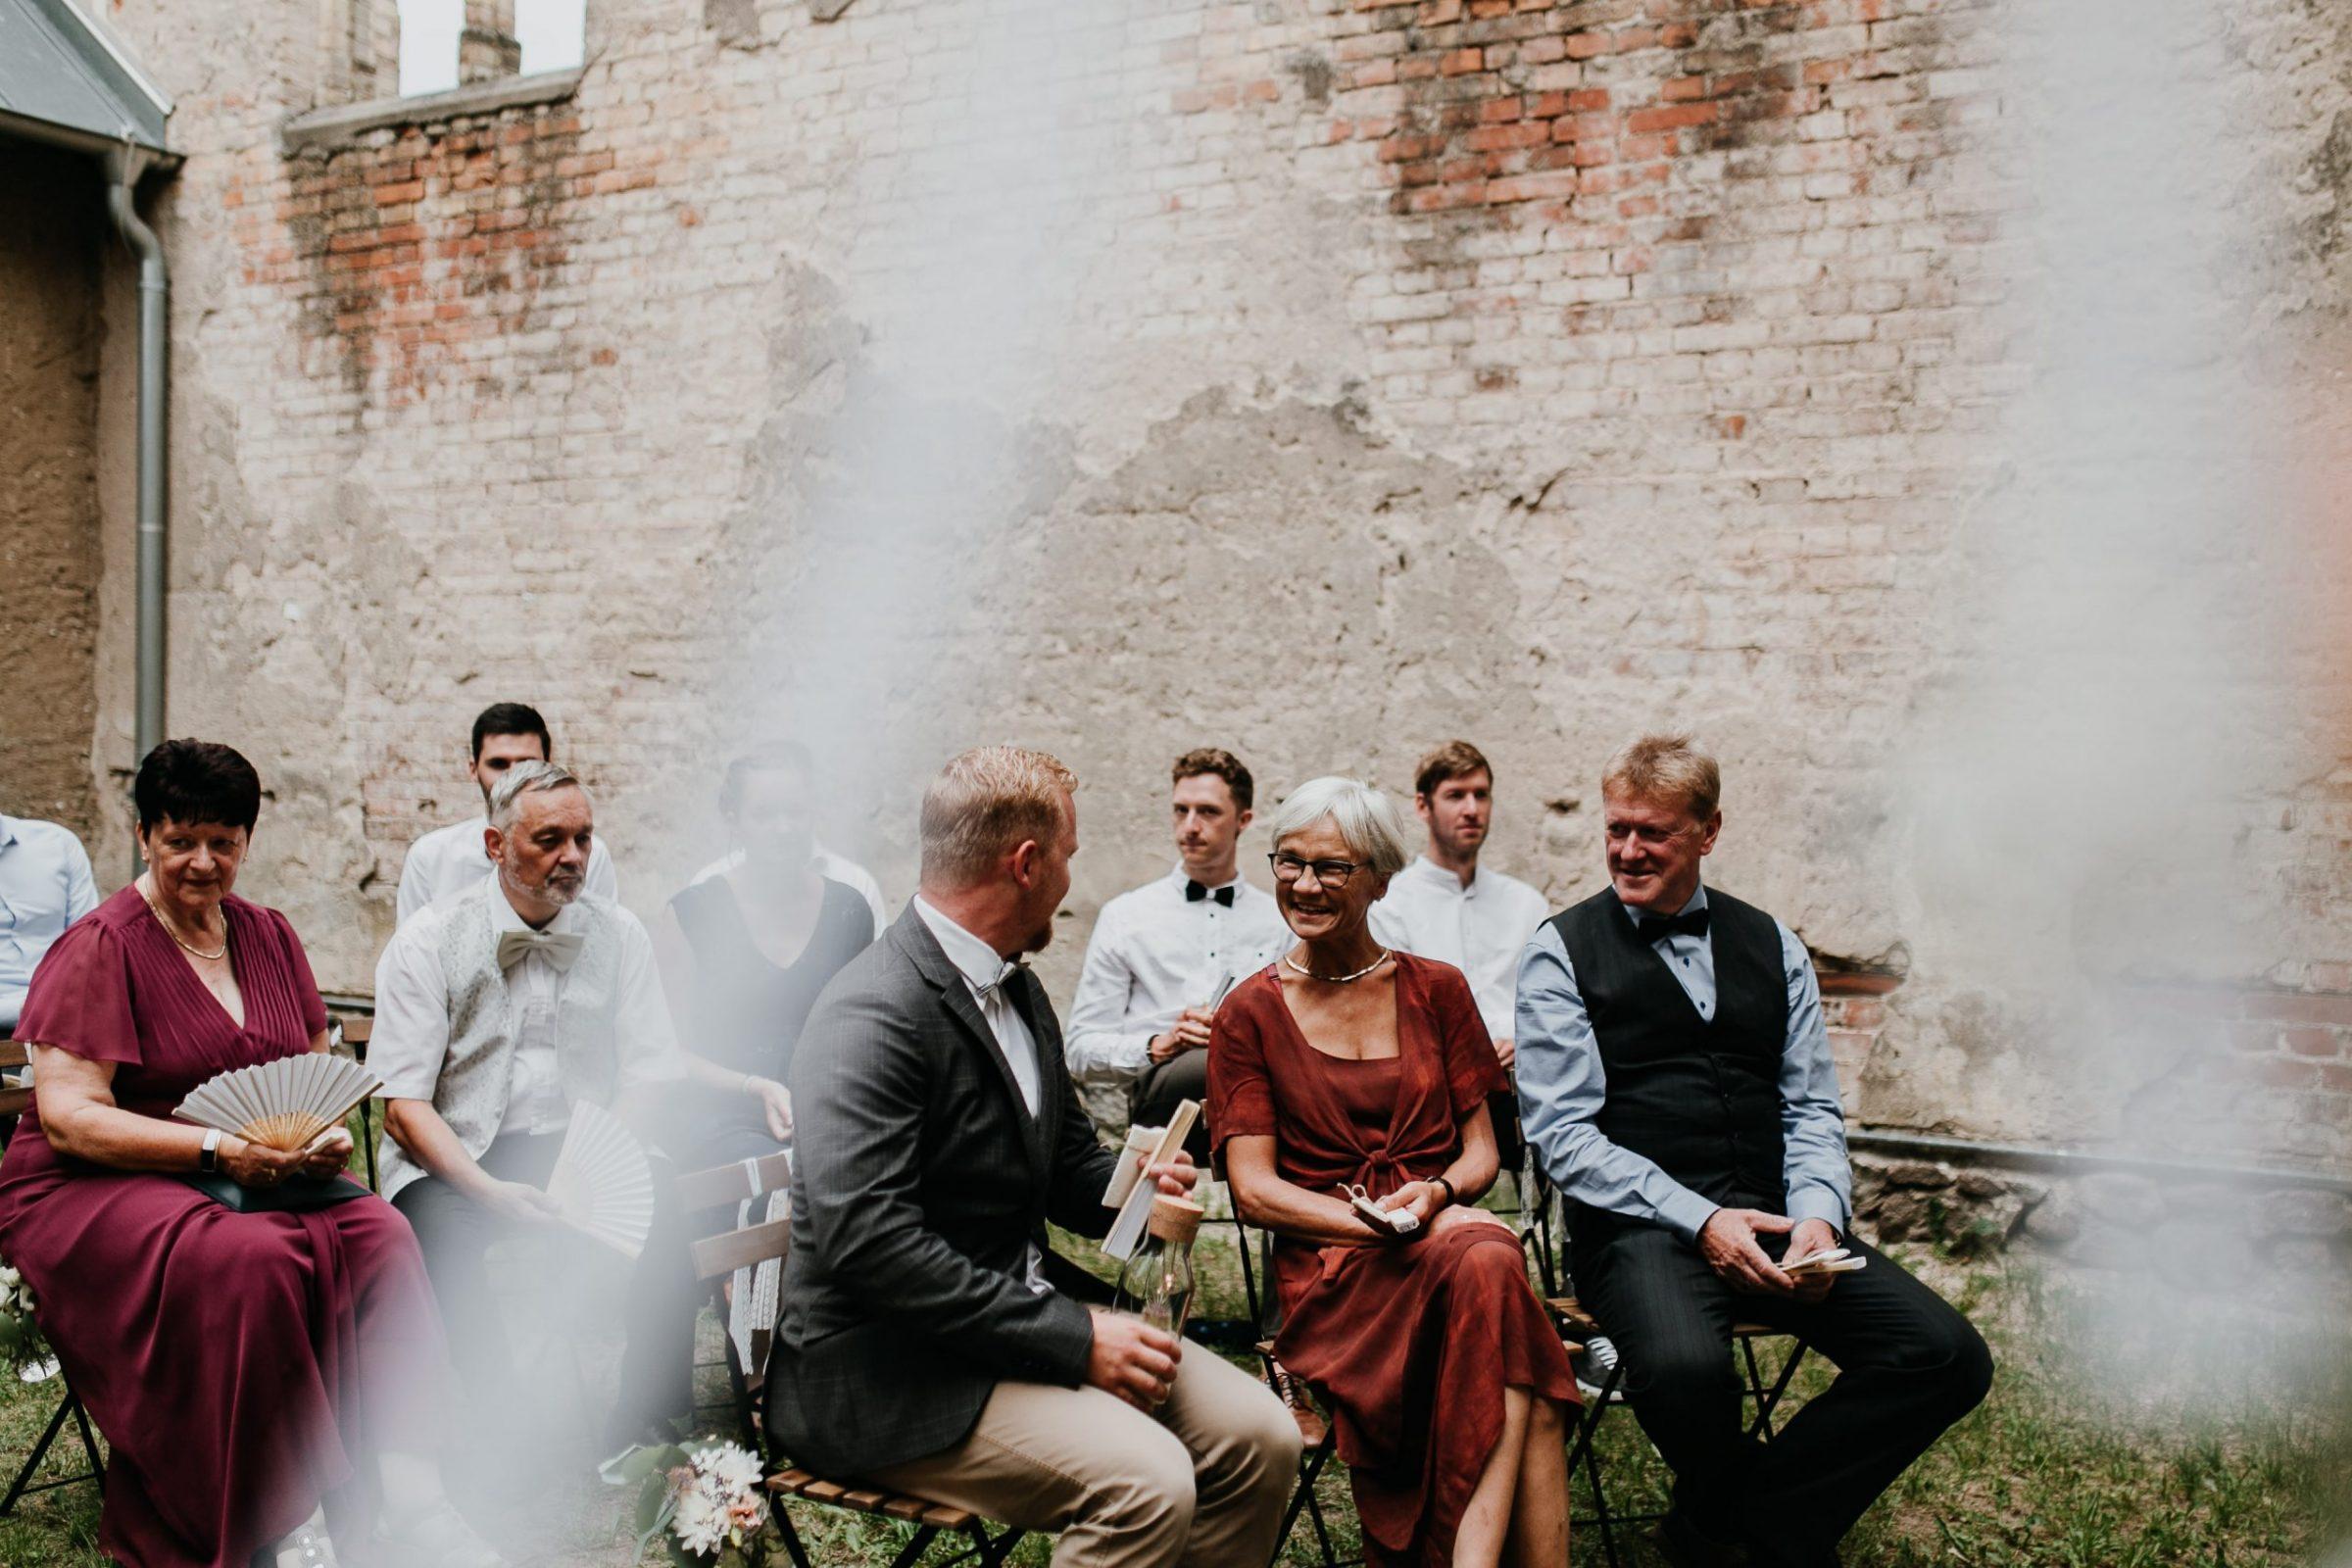 boho wedding, hochzeit berlin, wedding guests, Hochzeitsgaeste, trauung, freie trauung, ceremony